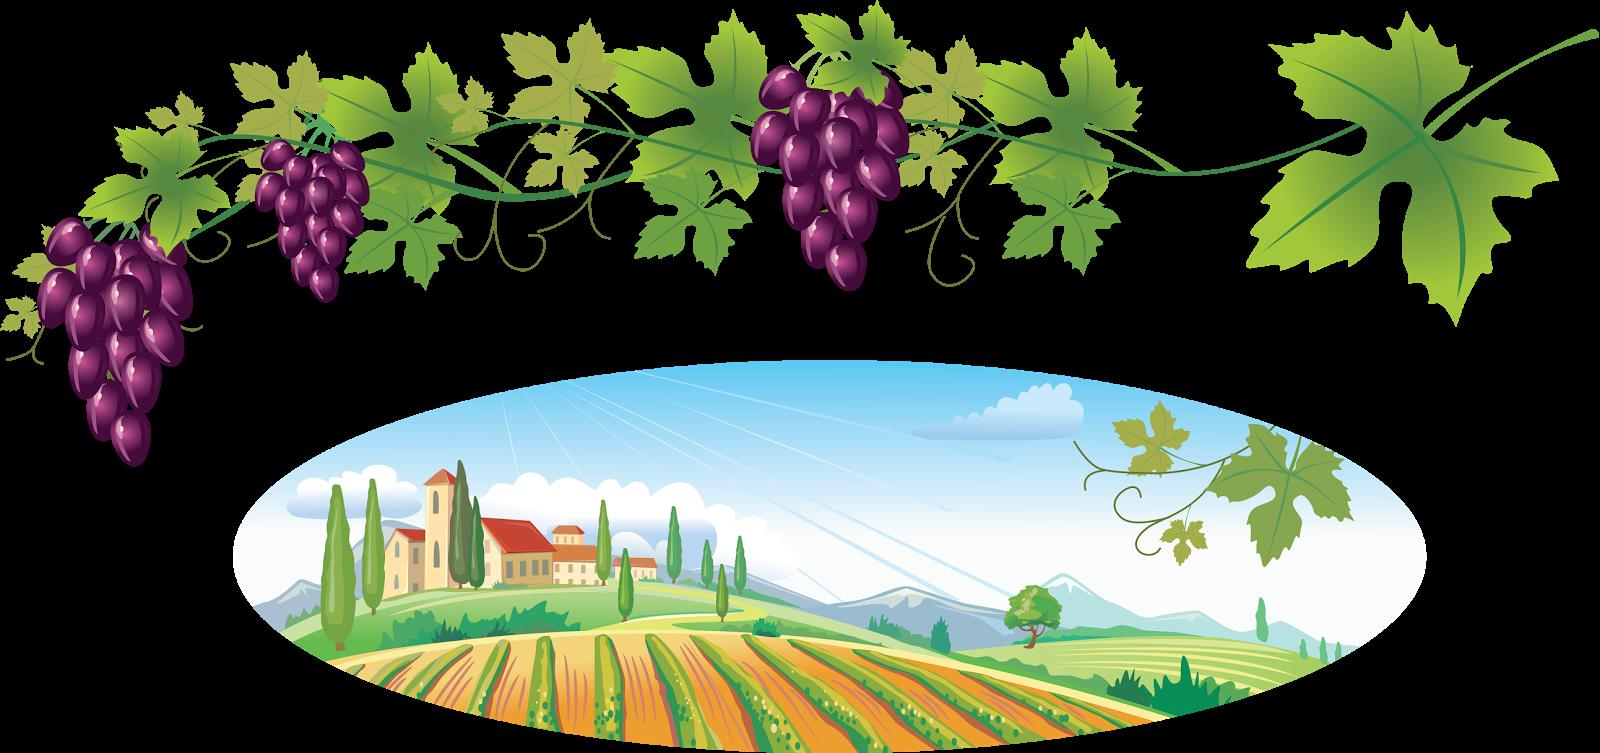 Forgetmenot fruits grapes. Grape clipart plum fruit